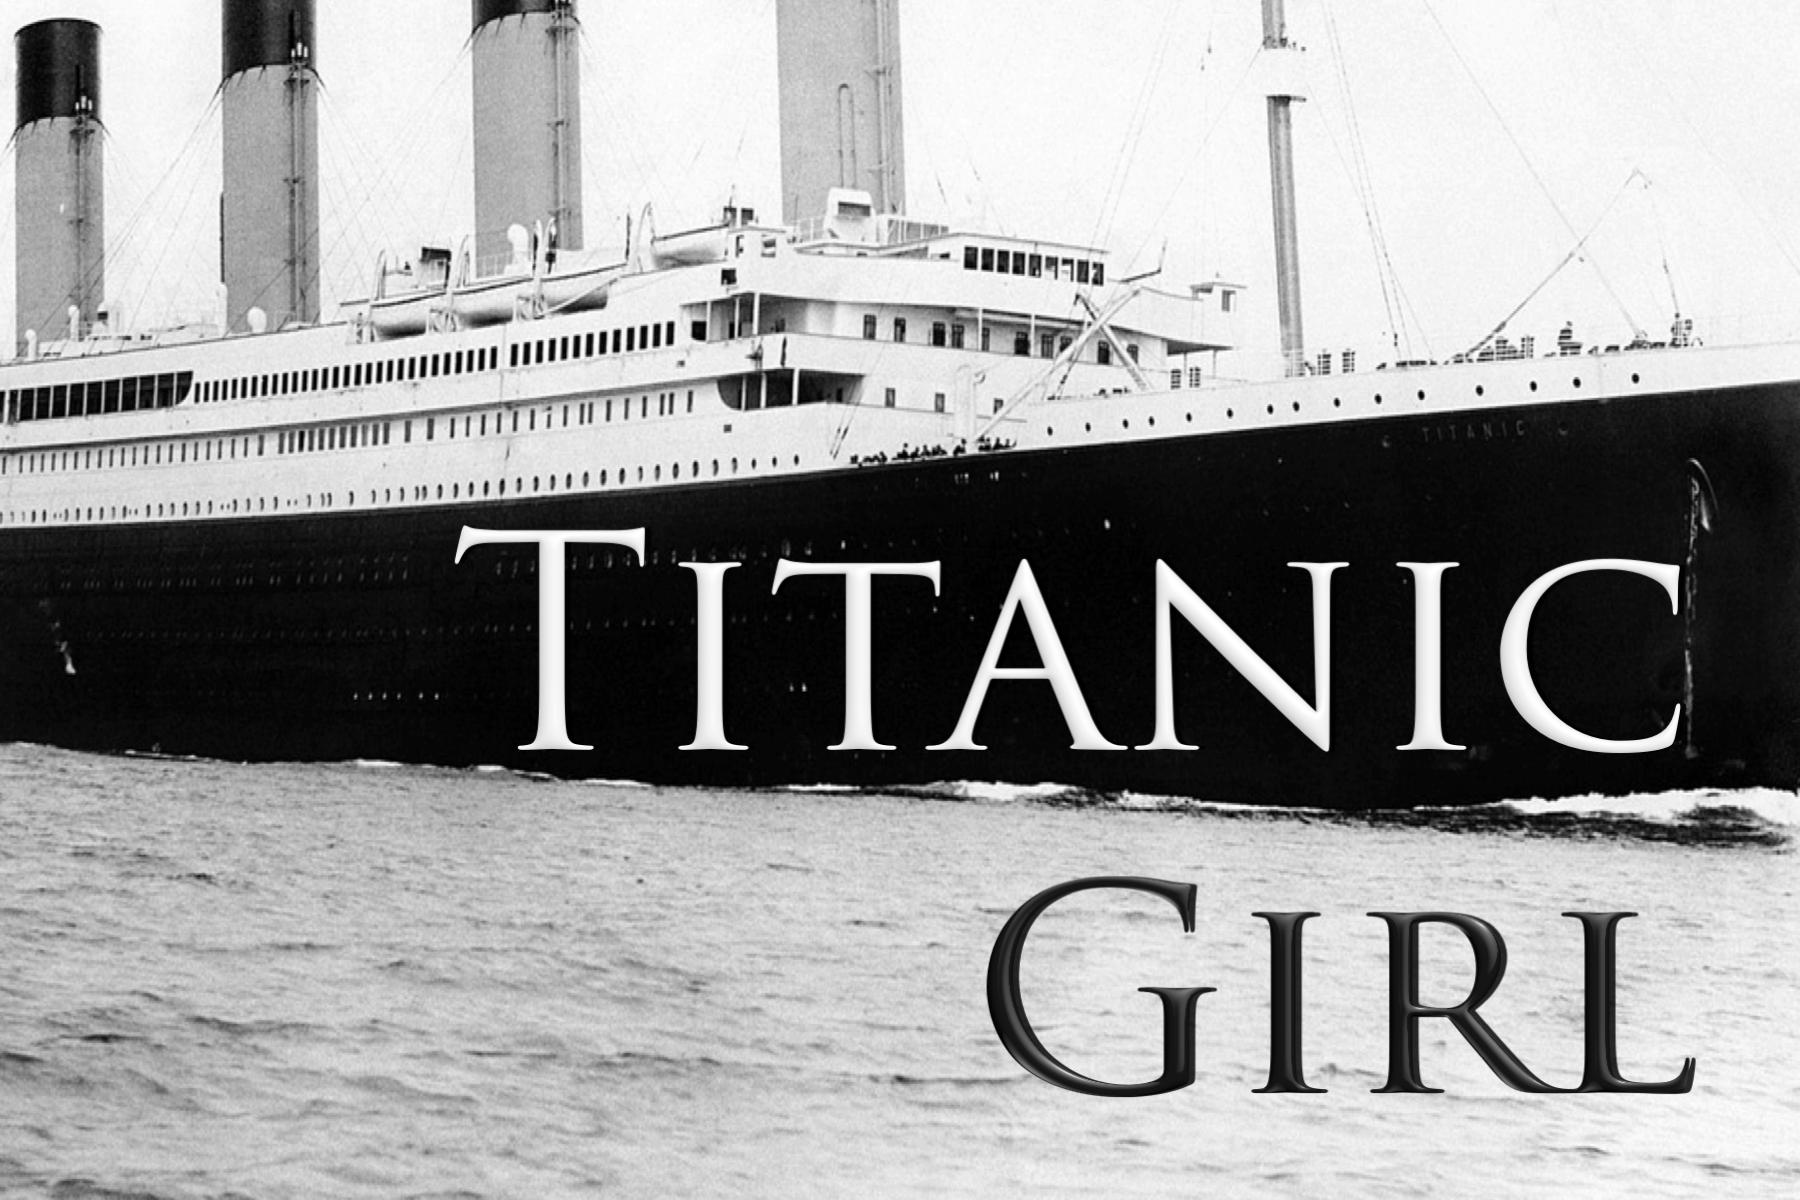 Titanic Girl